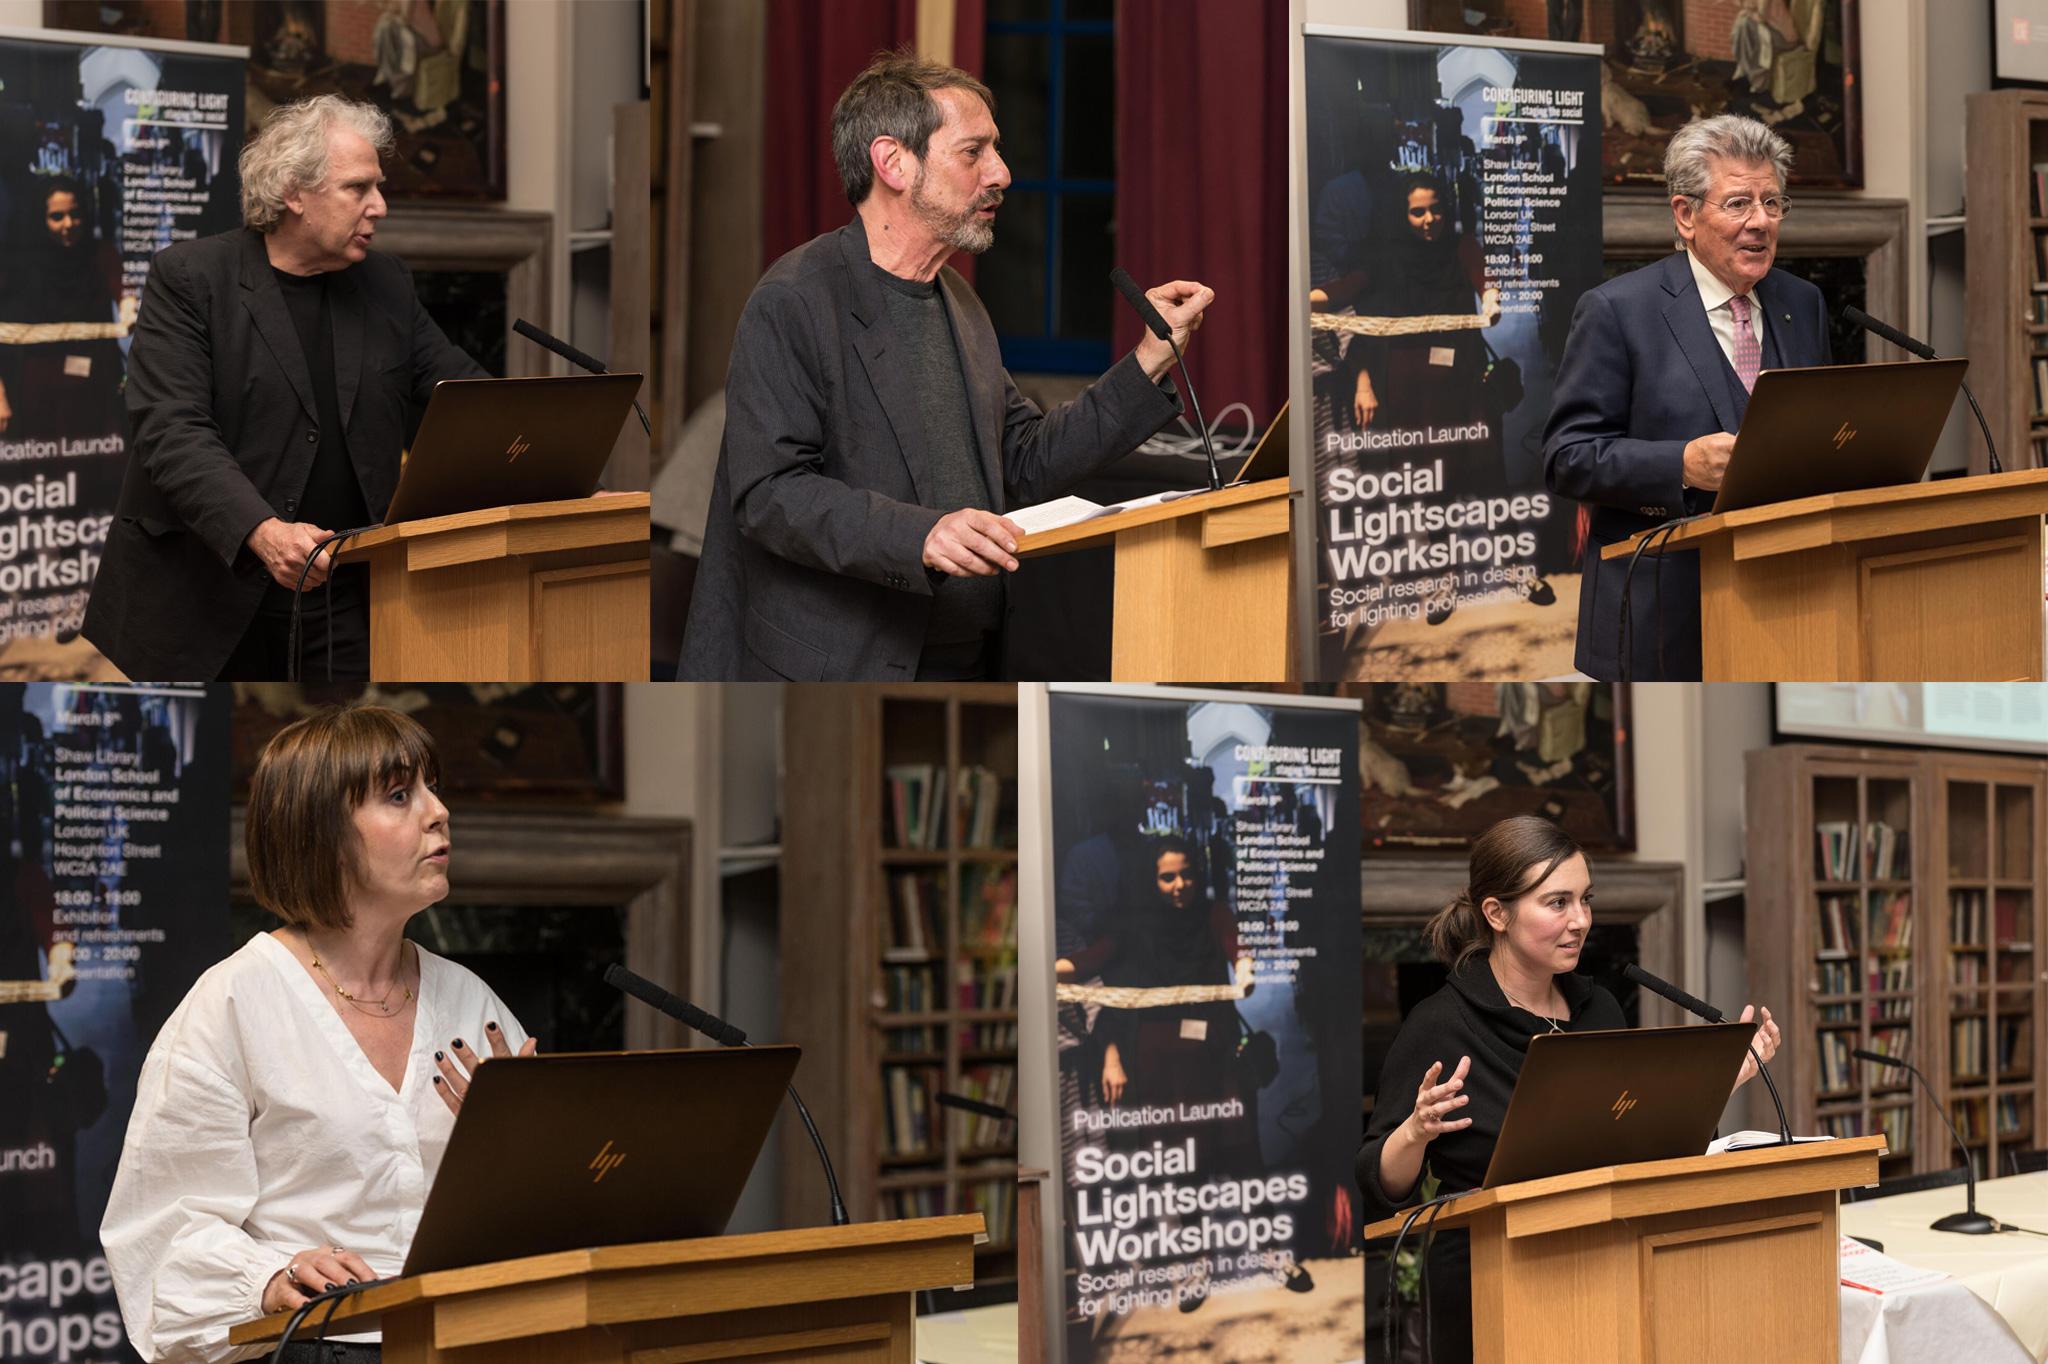 iGuzzini and Configuring Light (London School of Economics) present Social Lightscapes Workshops